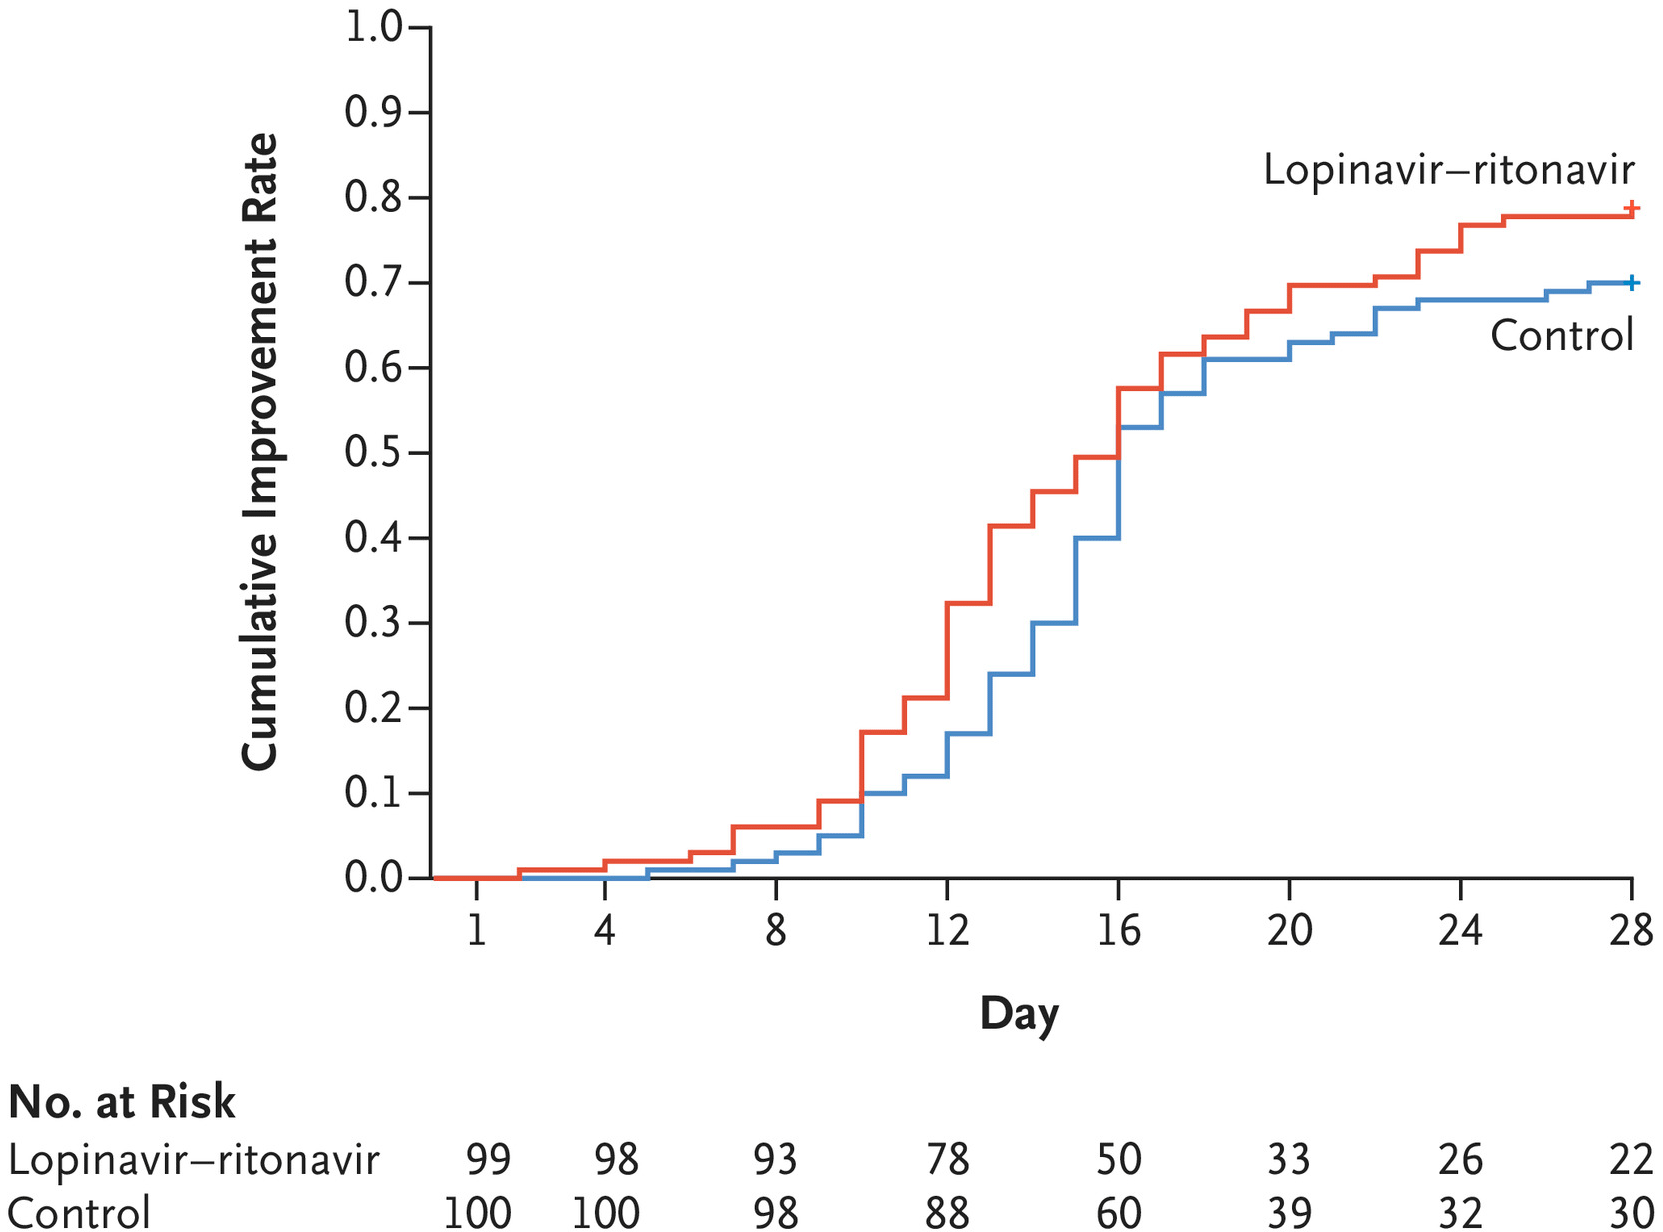 chictr2000029308 results 03 - Коронавирус. Лекарства. Лопинавир и ритонавир не помогли в лечении COVID-19